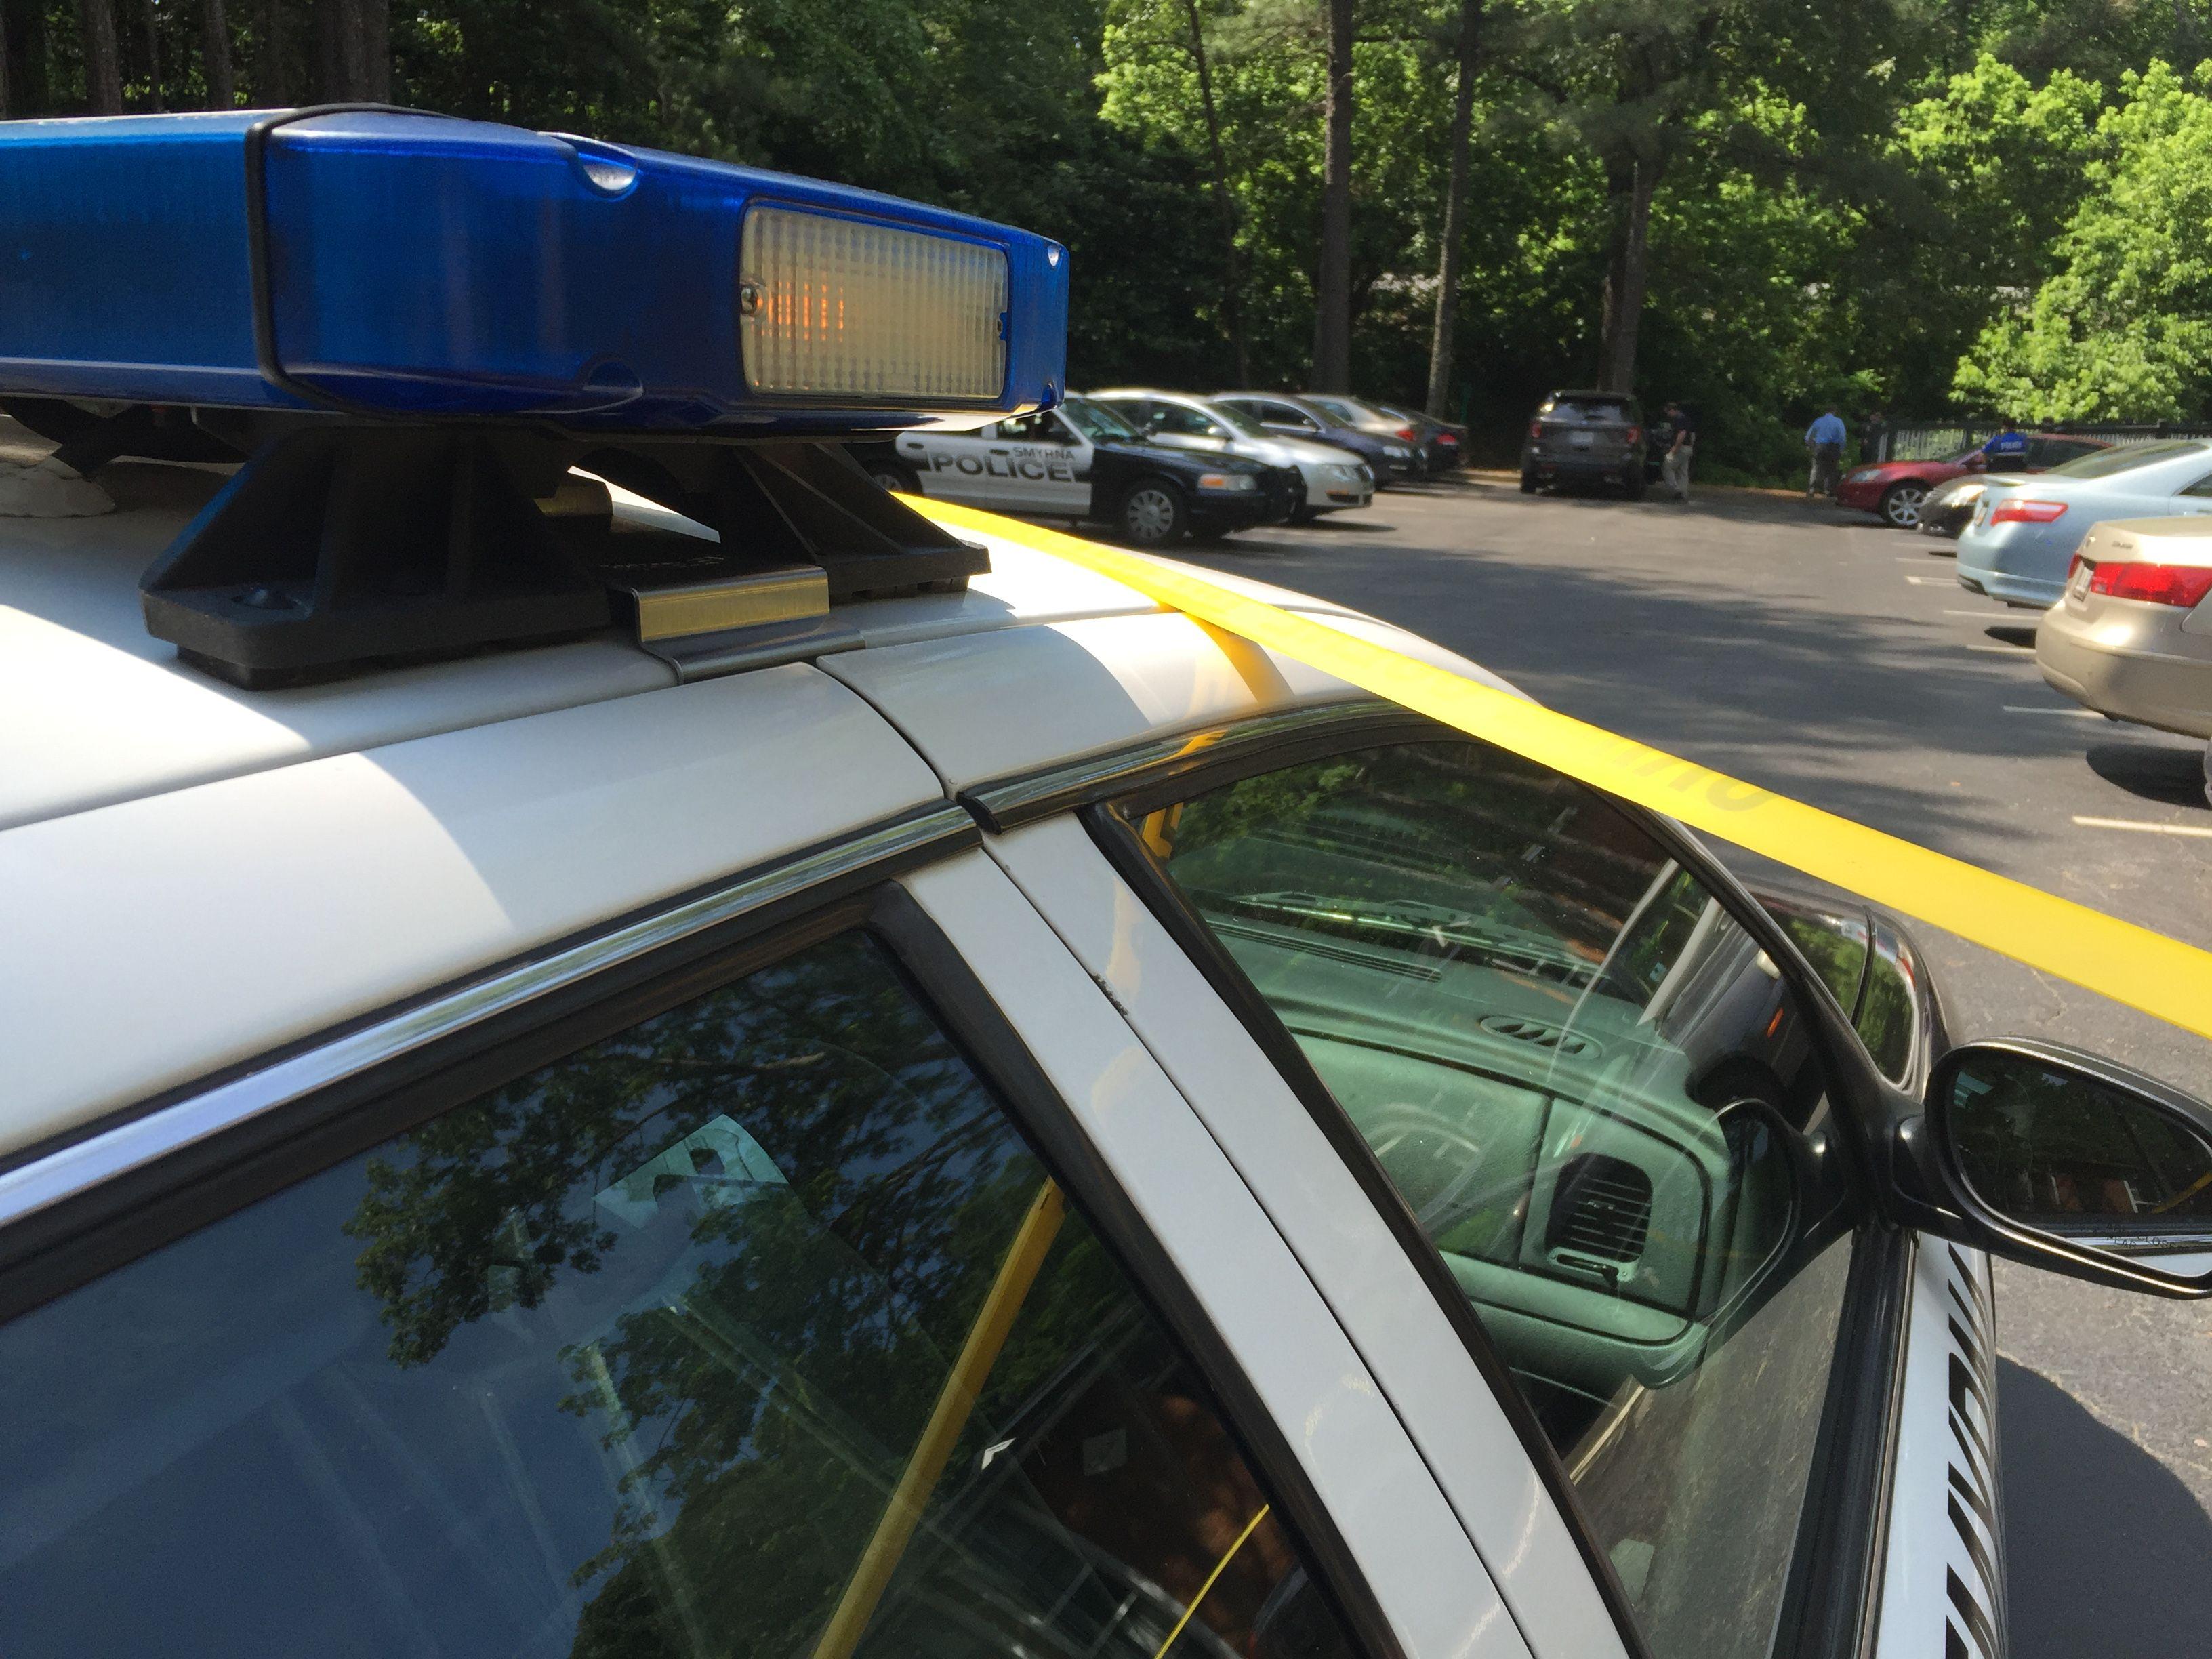 Police: Man ambushed on his way to work | 11alive.com